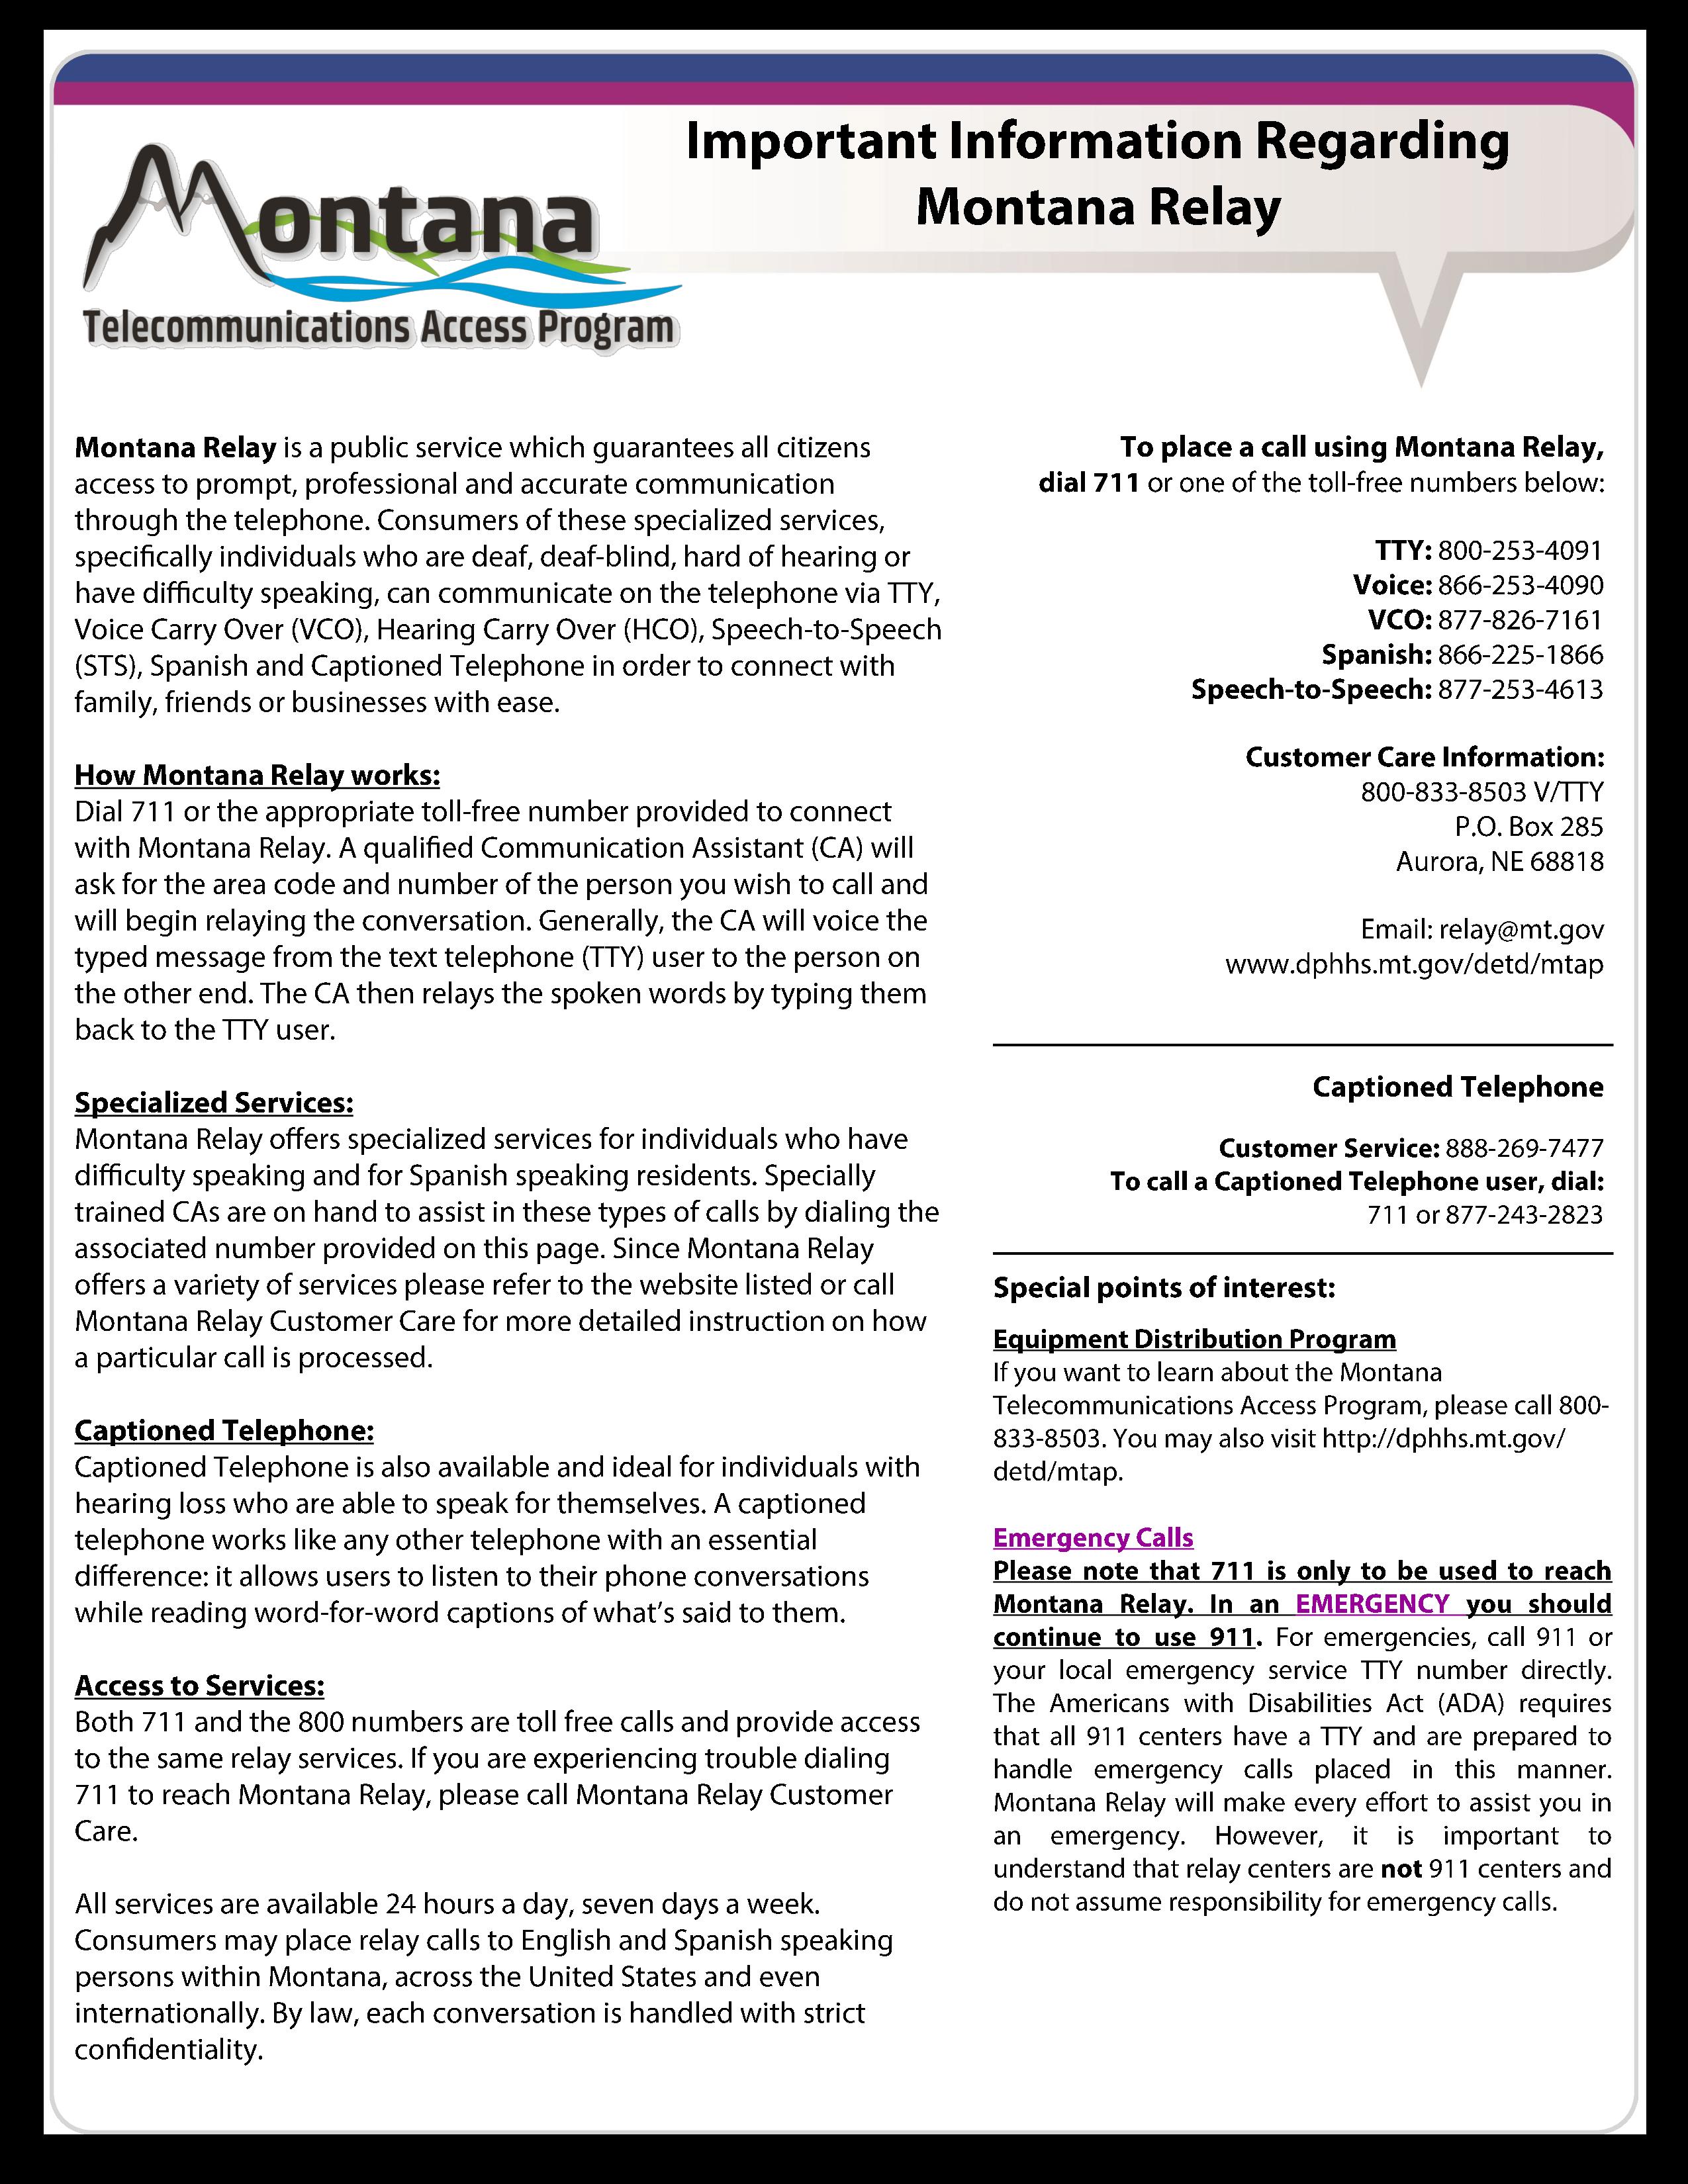 Southern Montana Telephone